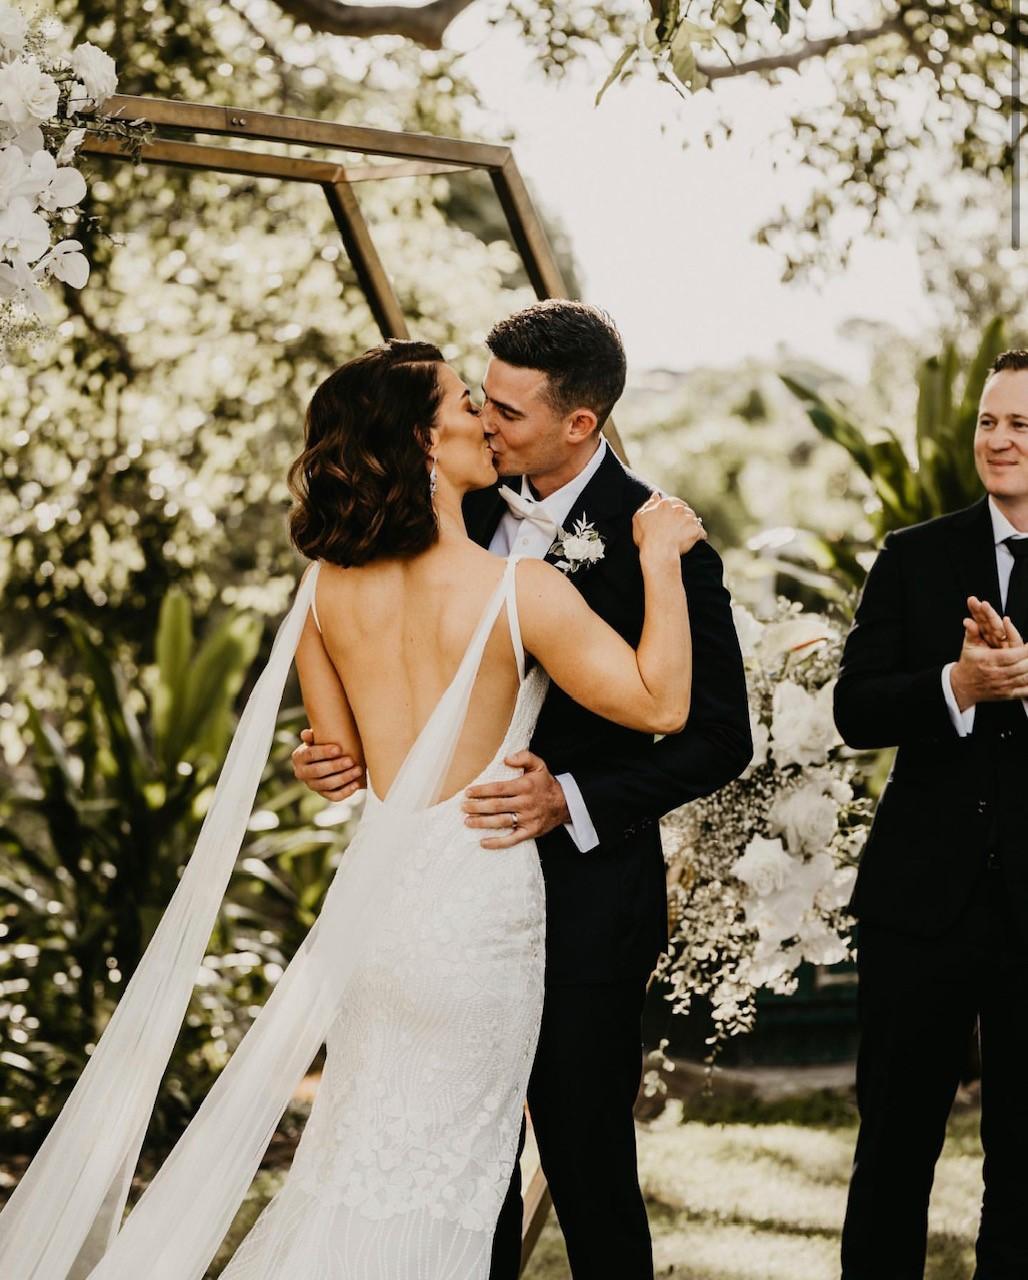 Roma Street Park wedding ceremony